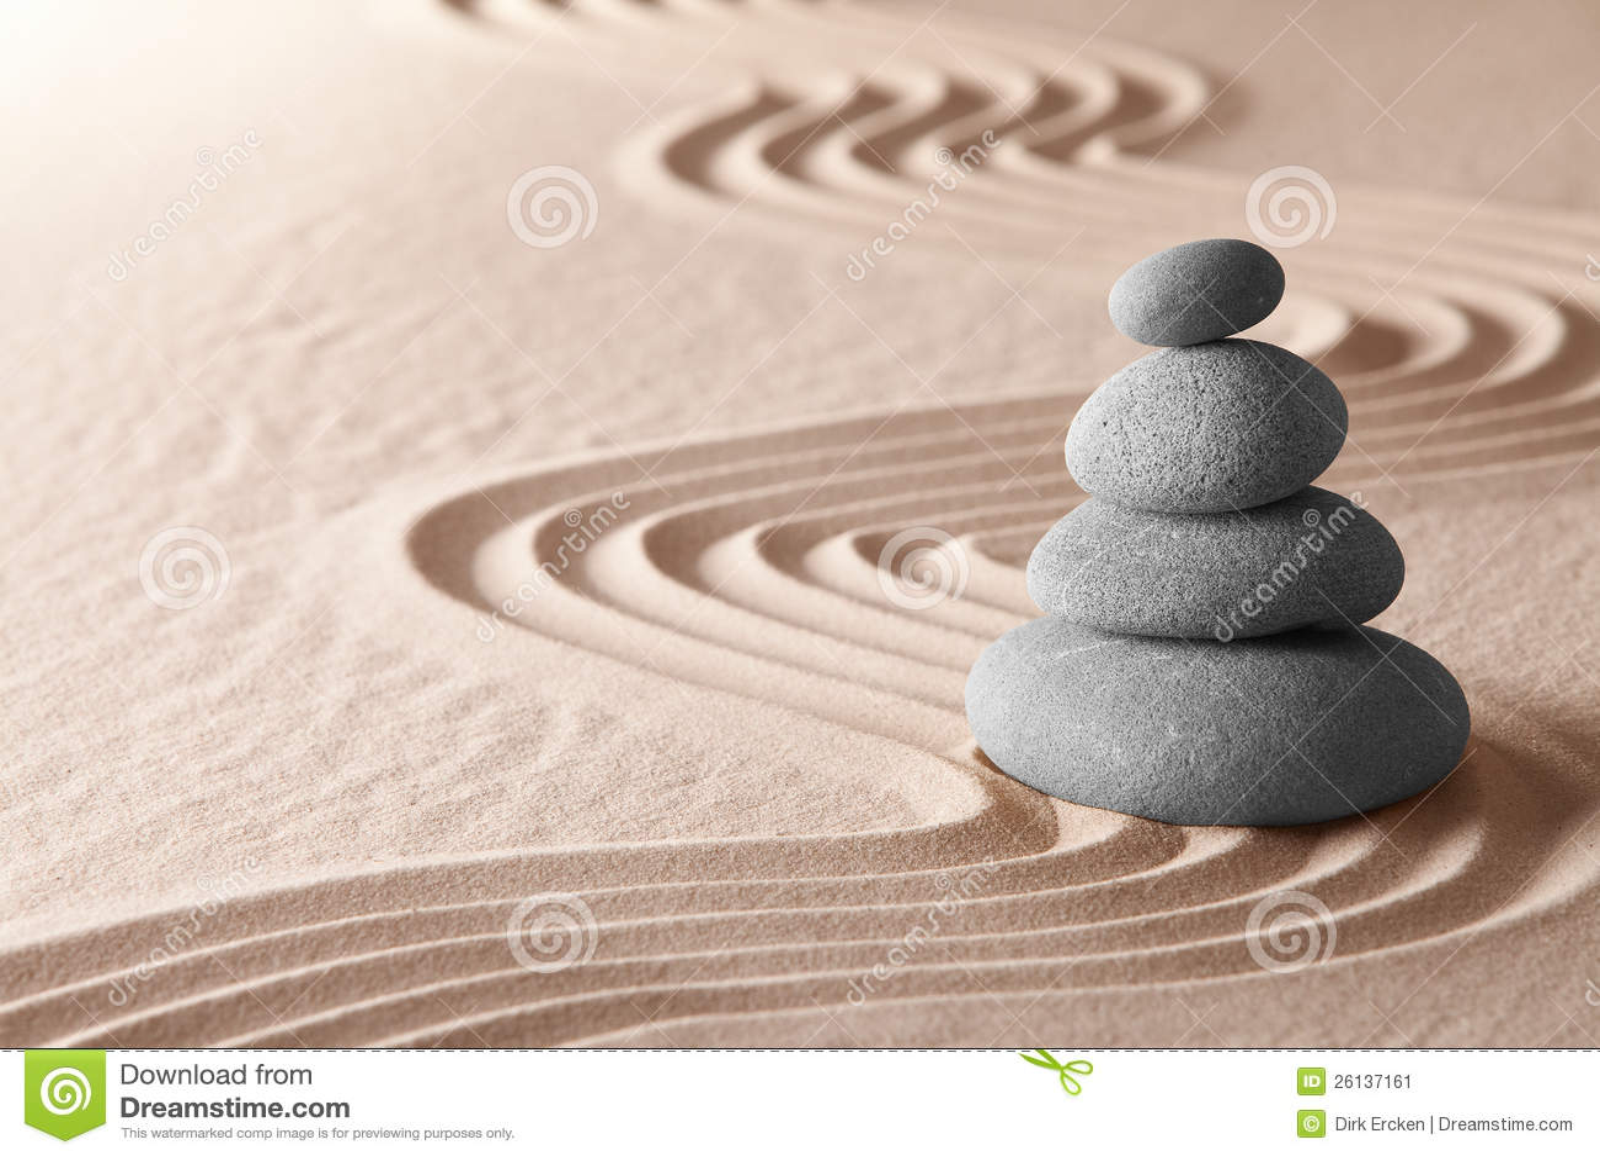 Zen meditation garden simplicity harmony